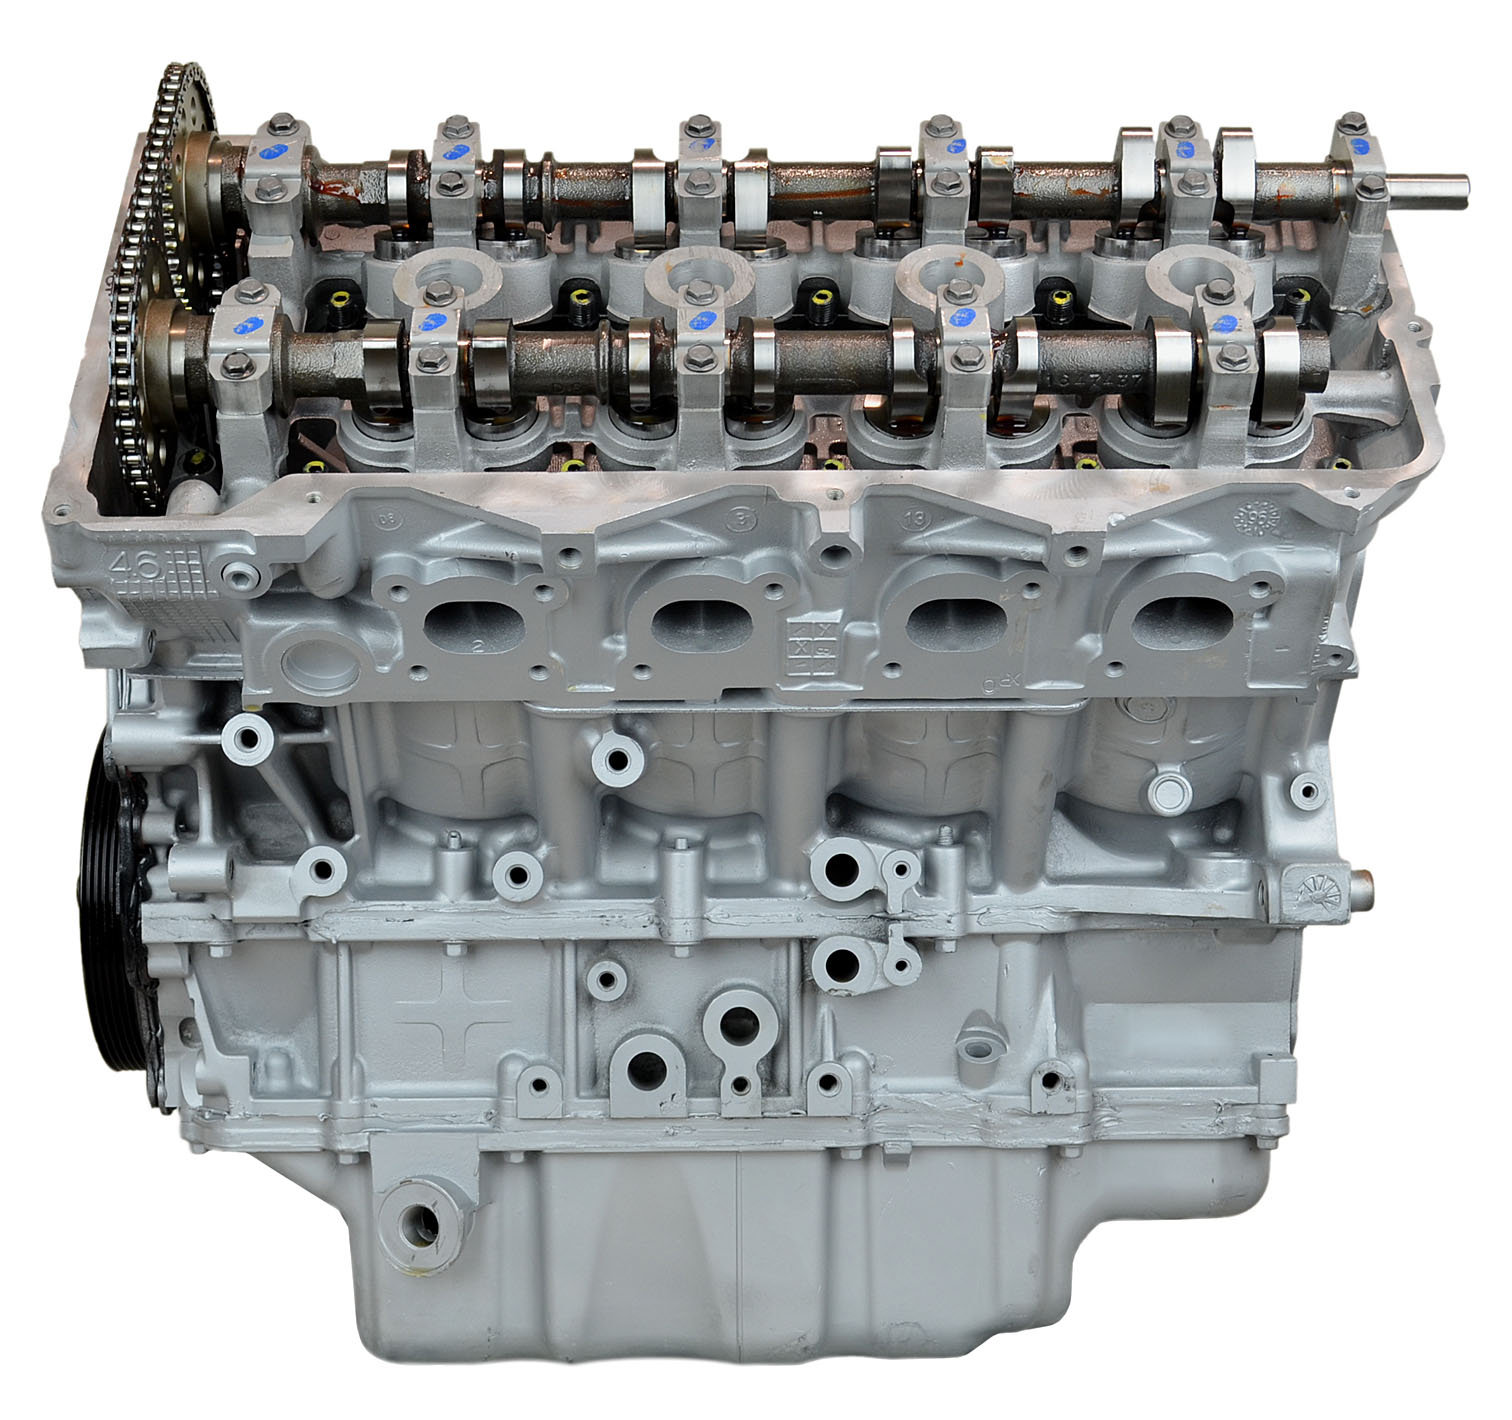 96-99 Cadillac Seville 4.6 NorthStar Engine VIN Y